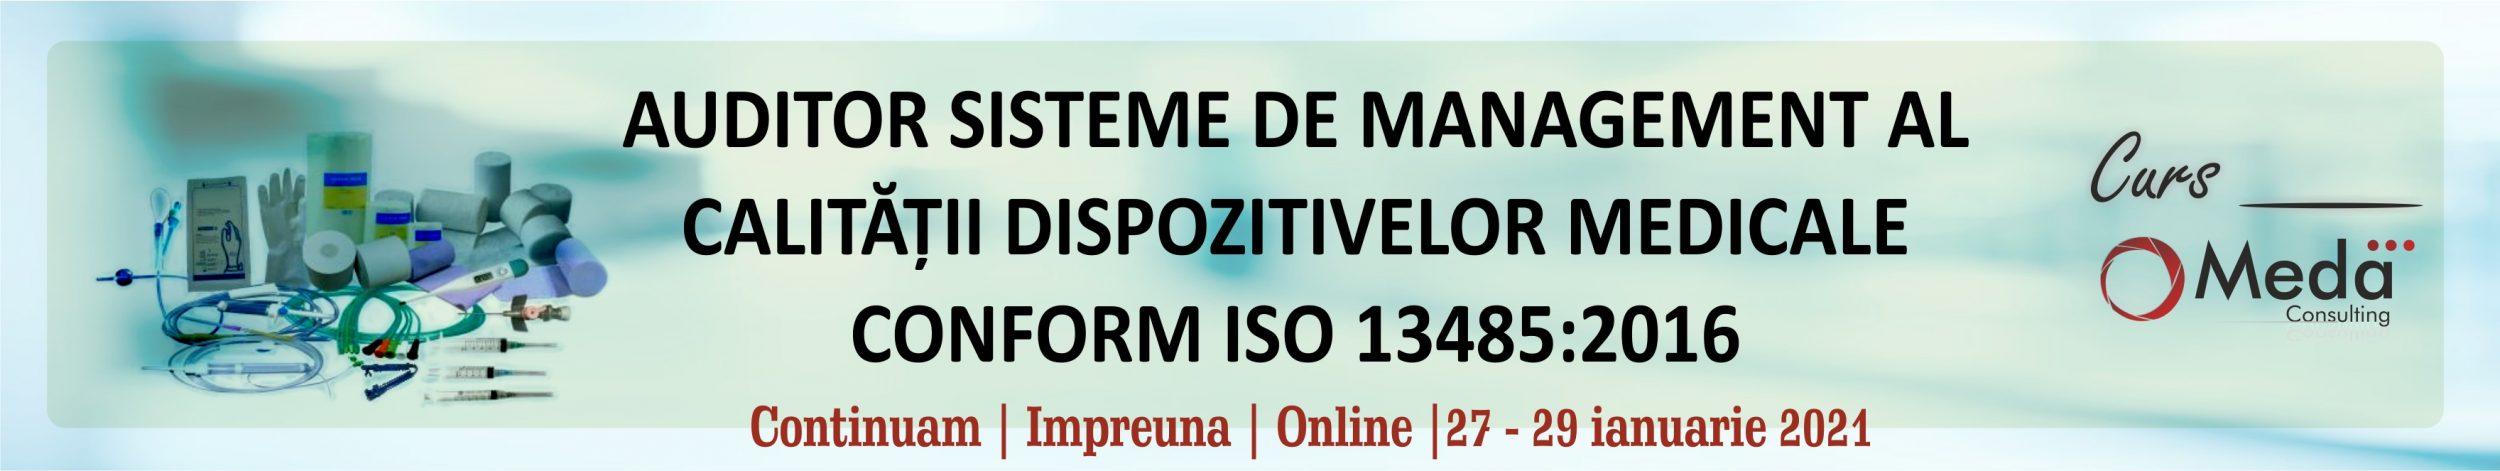 AUDITOR SISTEME DE MANAGEMENT AL CALITATII DISPOZITIVELOR MEDICALE CONFORM ISO 13485:2016